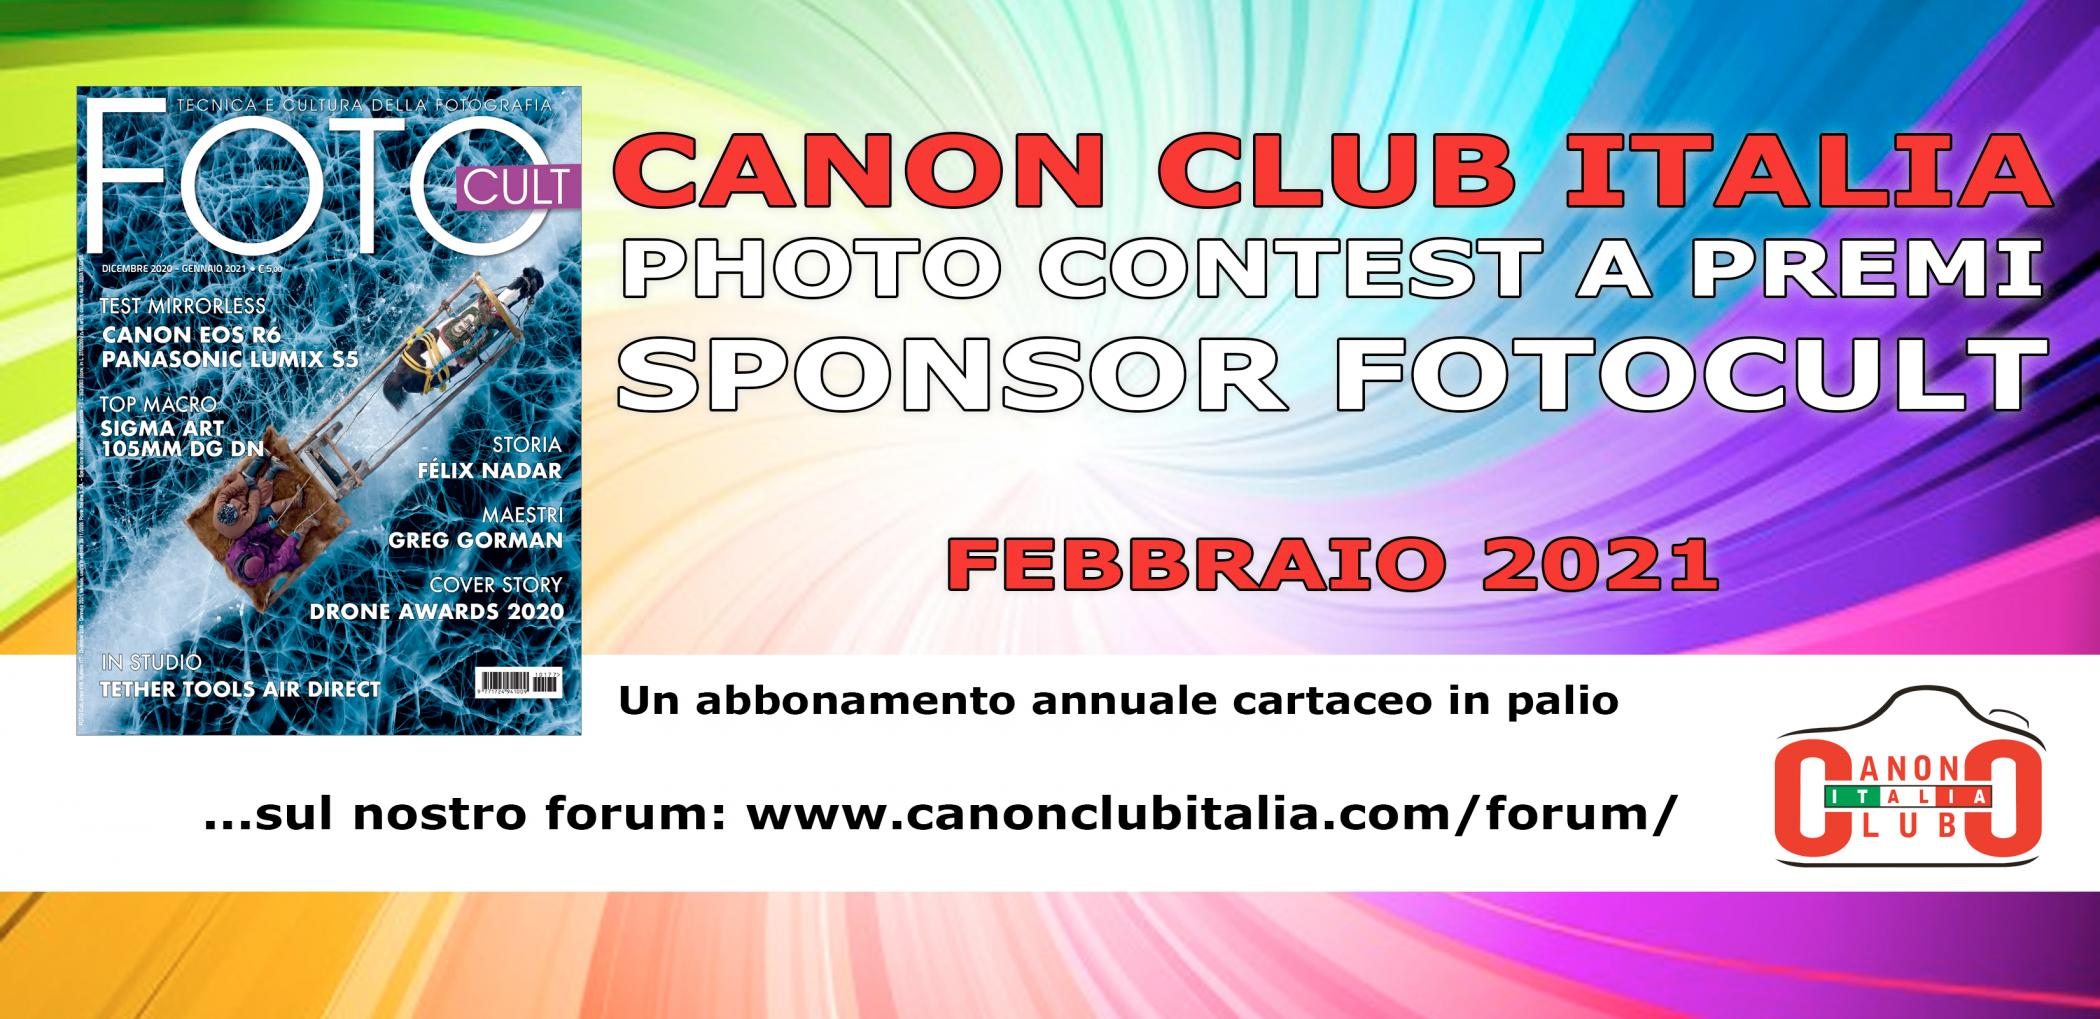 canon club photo contest fotocult.jpg